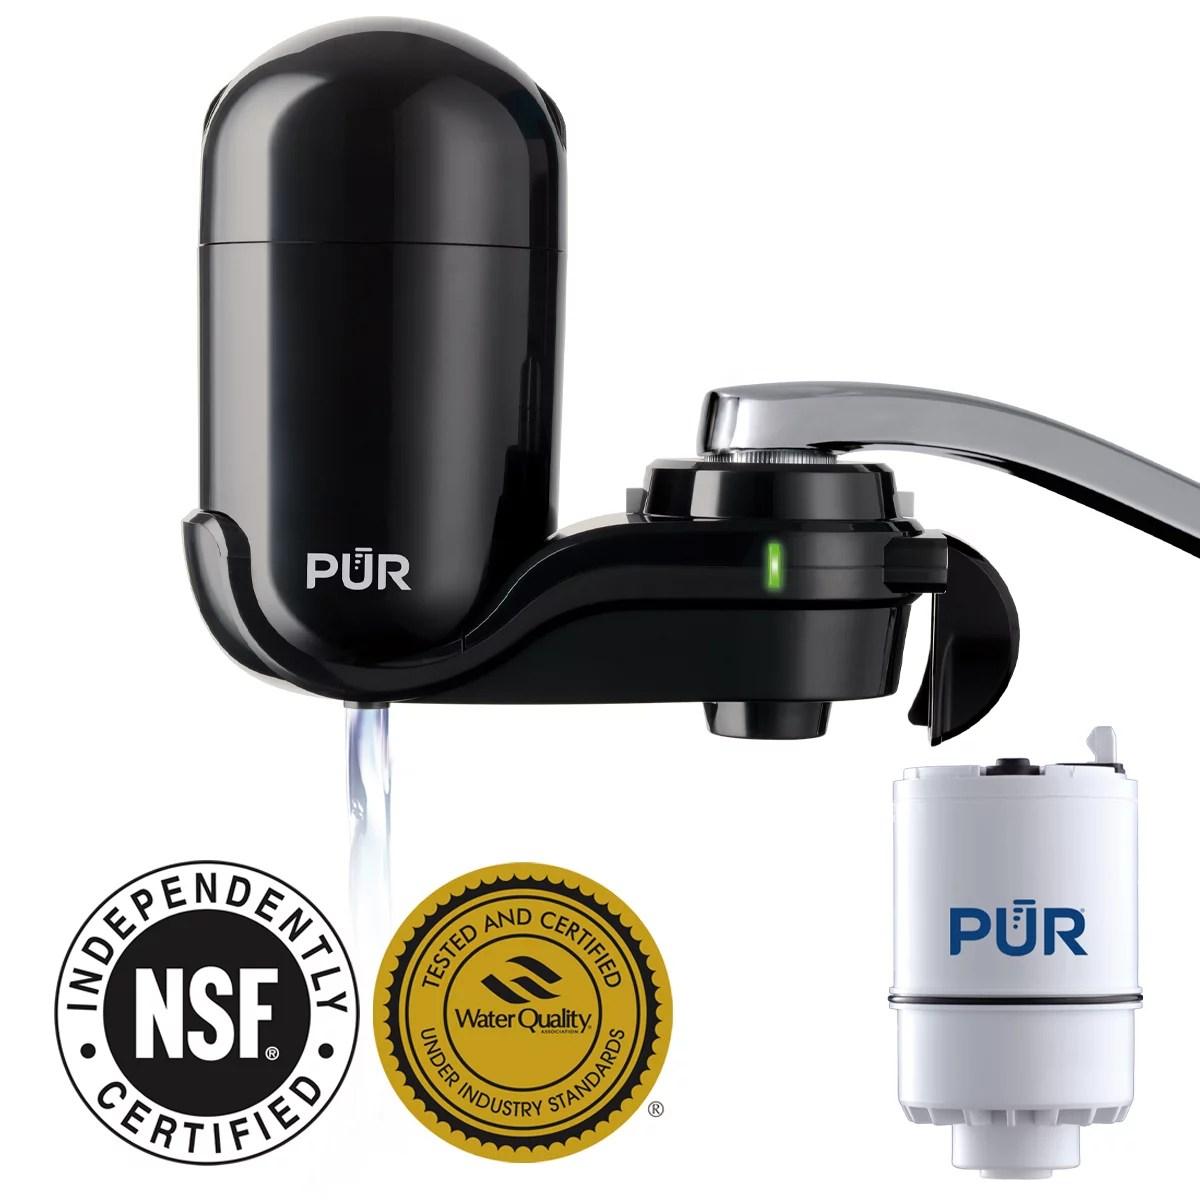 pur faucet water filter fm 2000b black